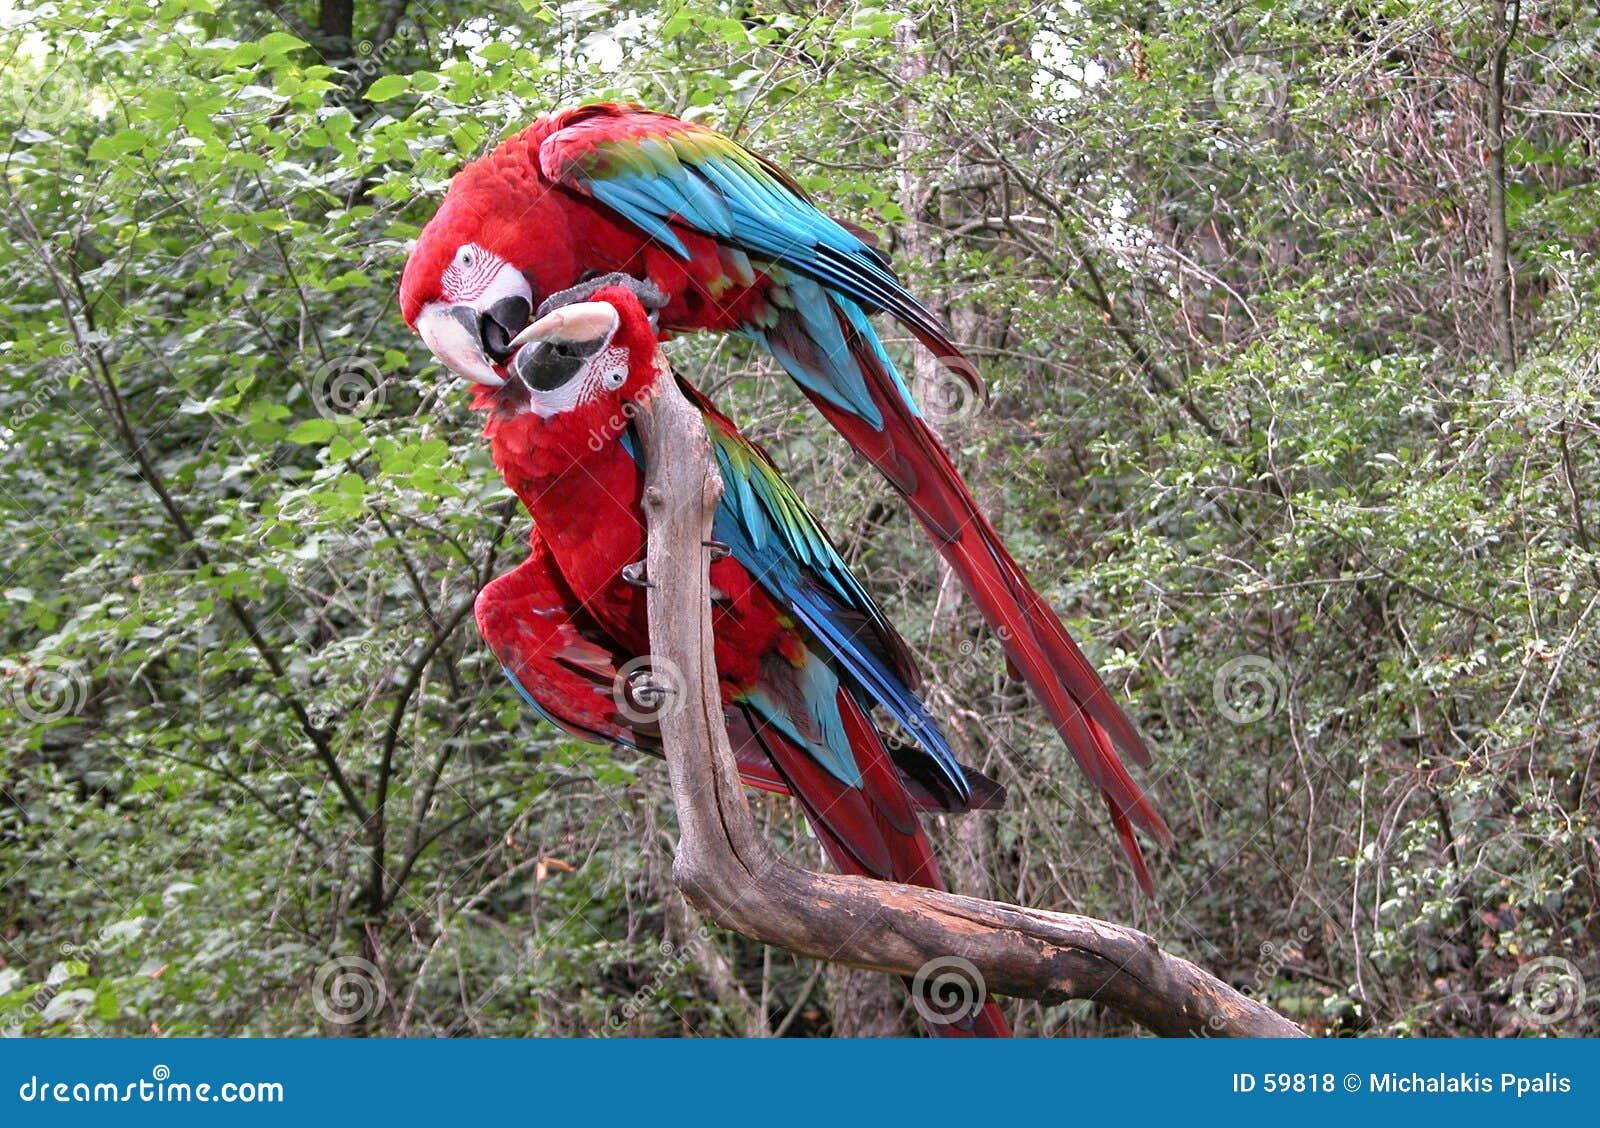 Pair of parrot birds